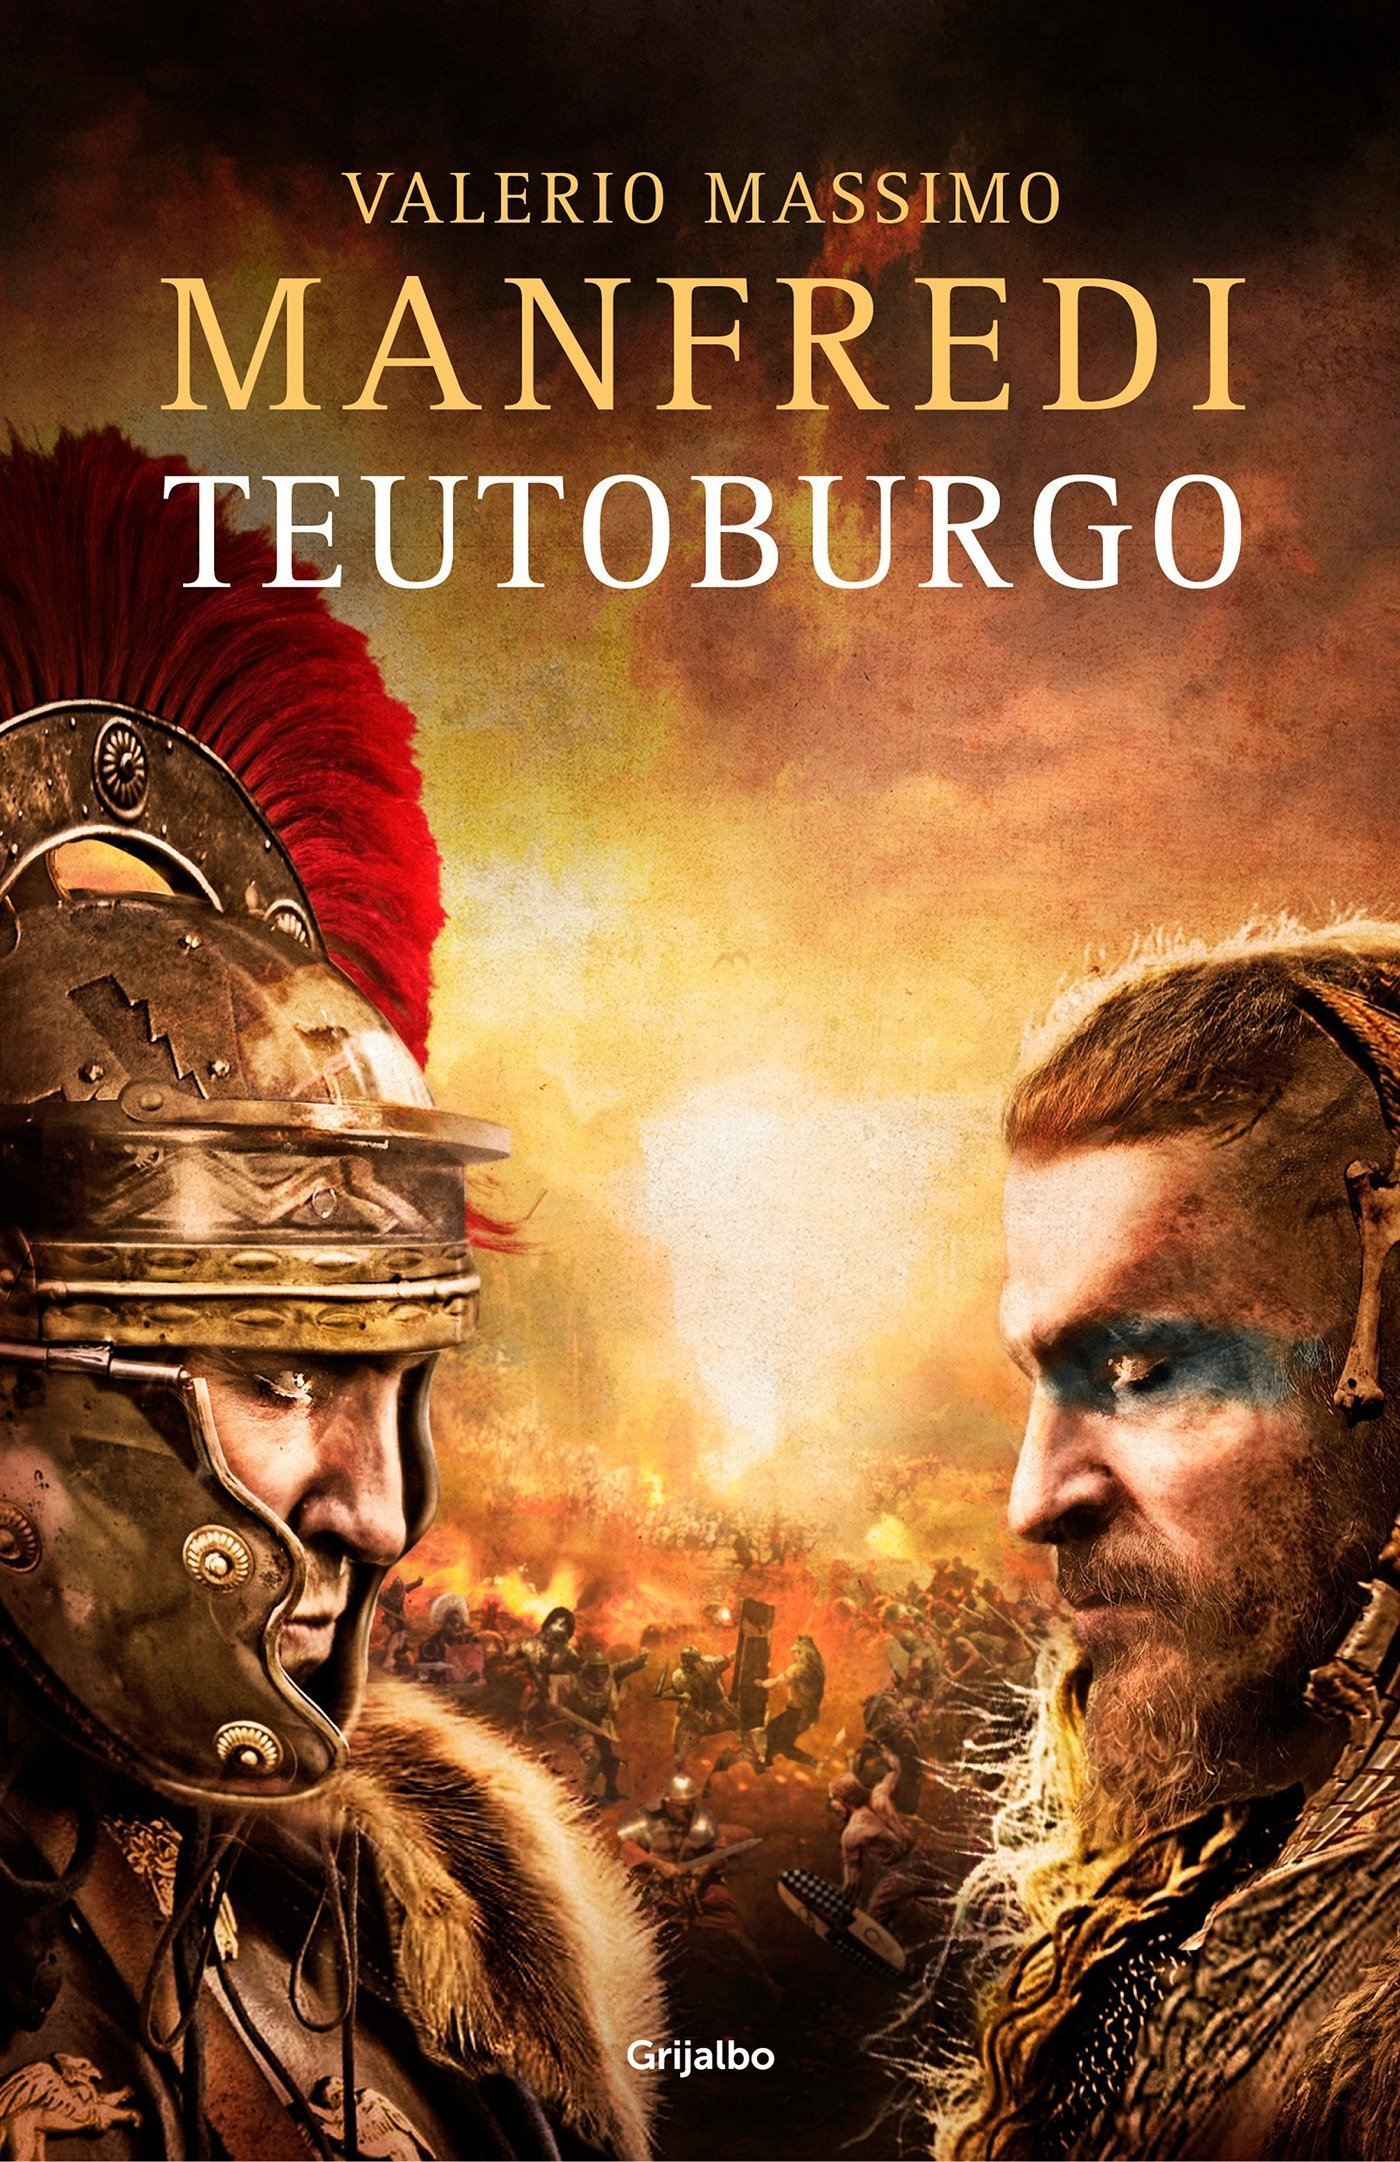 Download Teutoburgo / Teutoburg Forest (Spanish Edition) ePub fb2 ebook